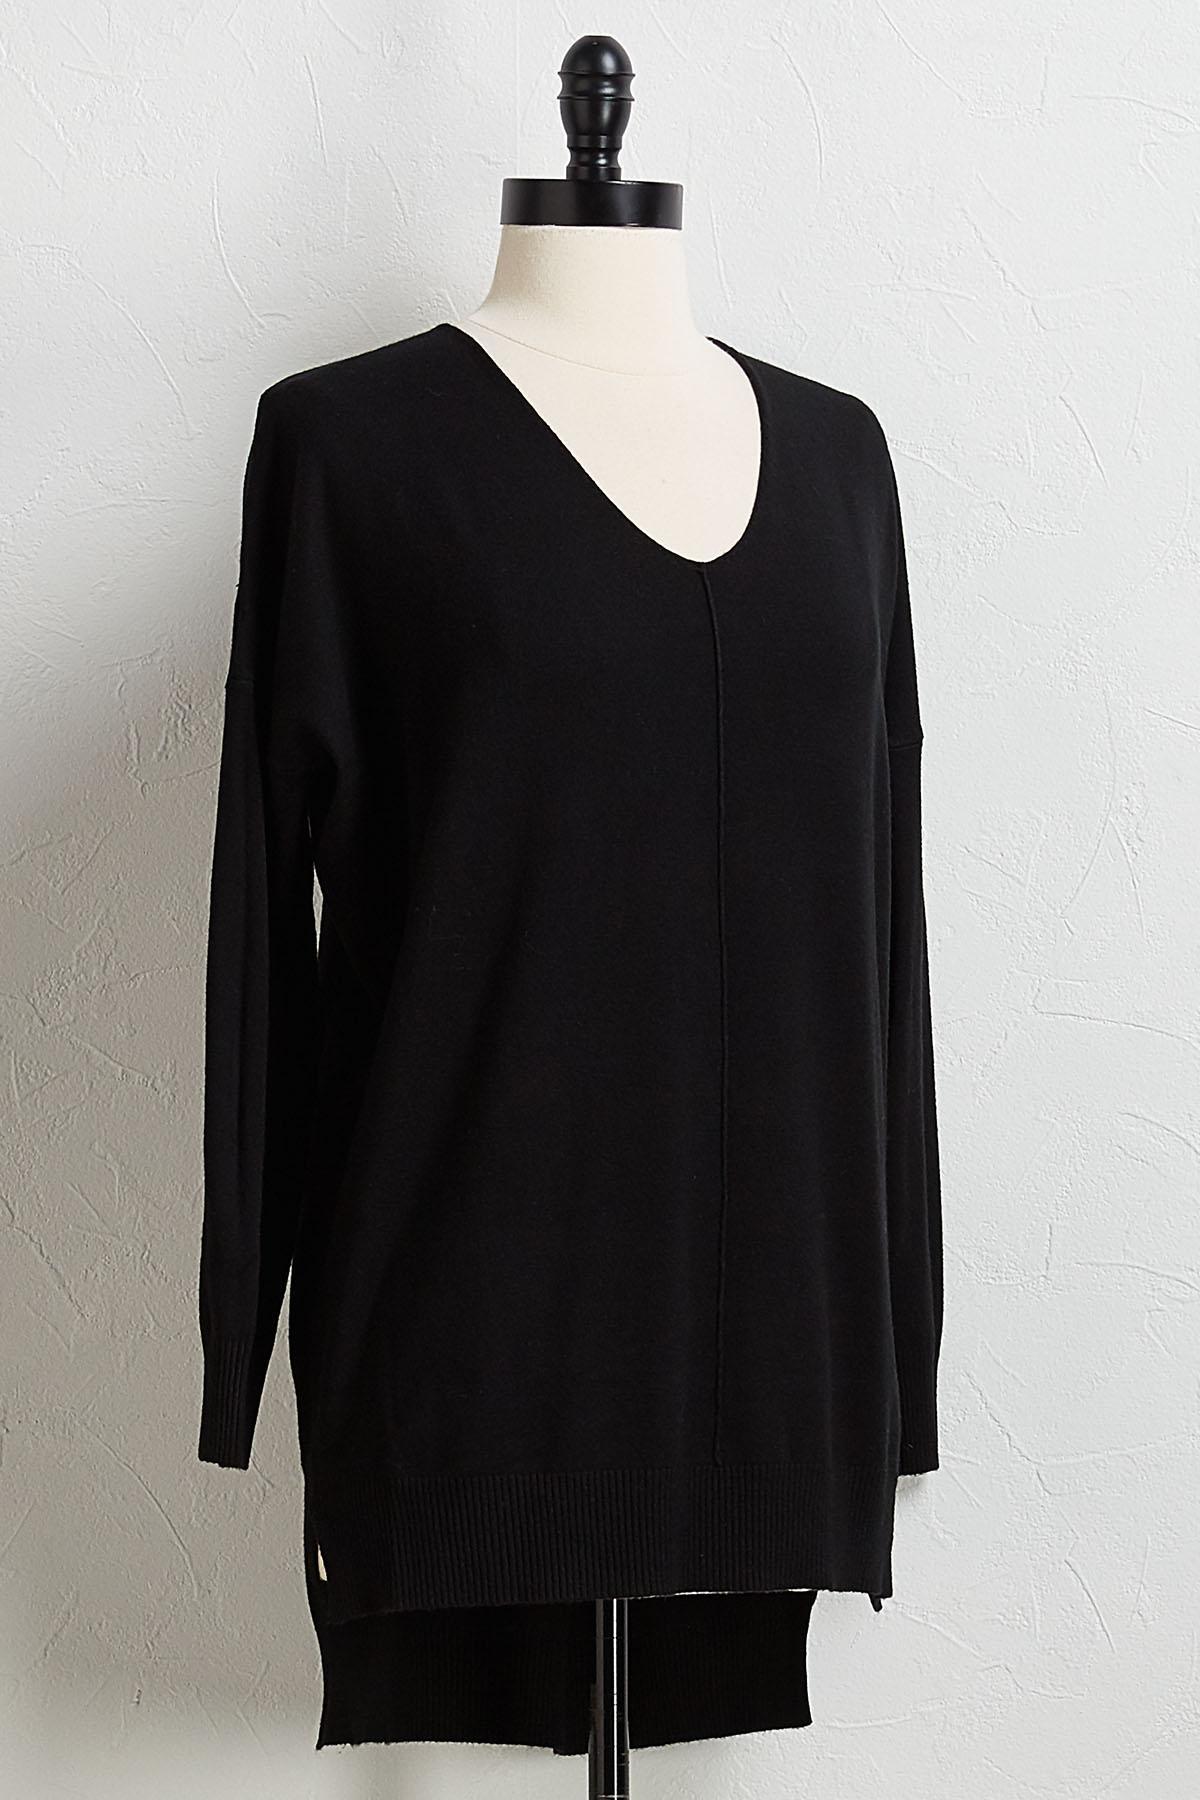 Black Step Up Tunic Sweater